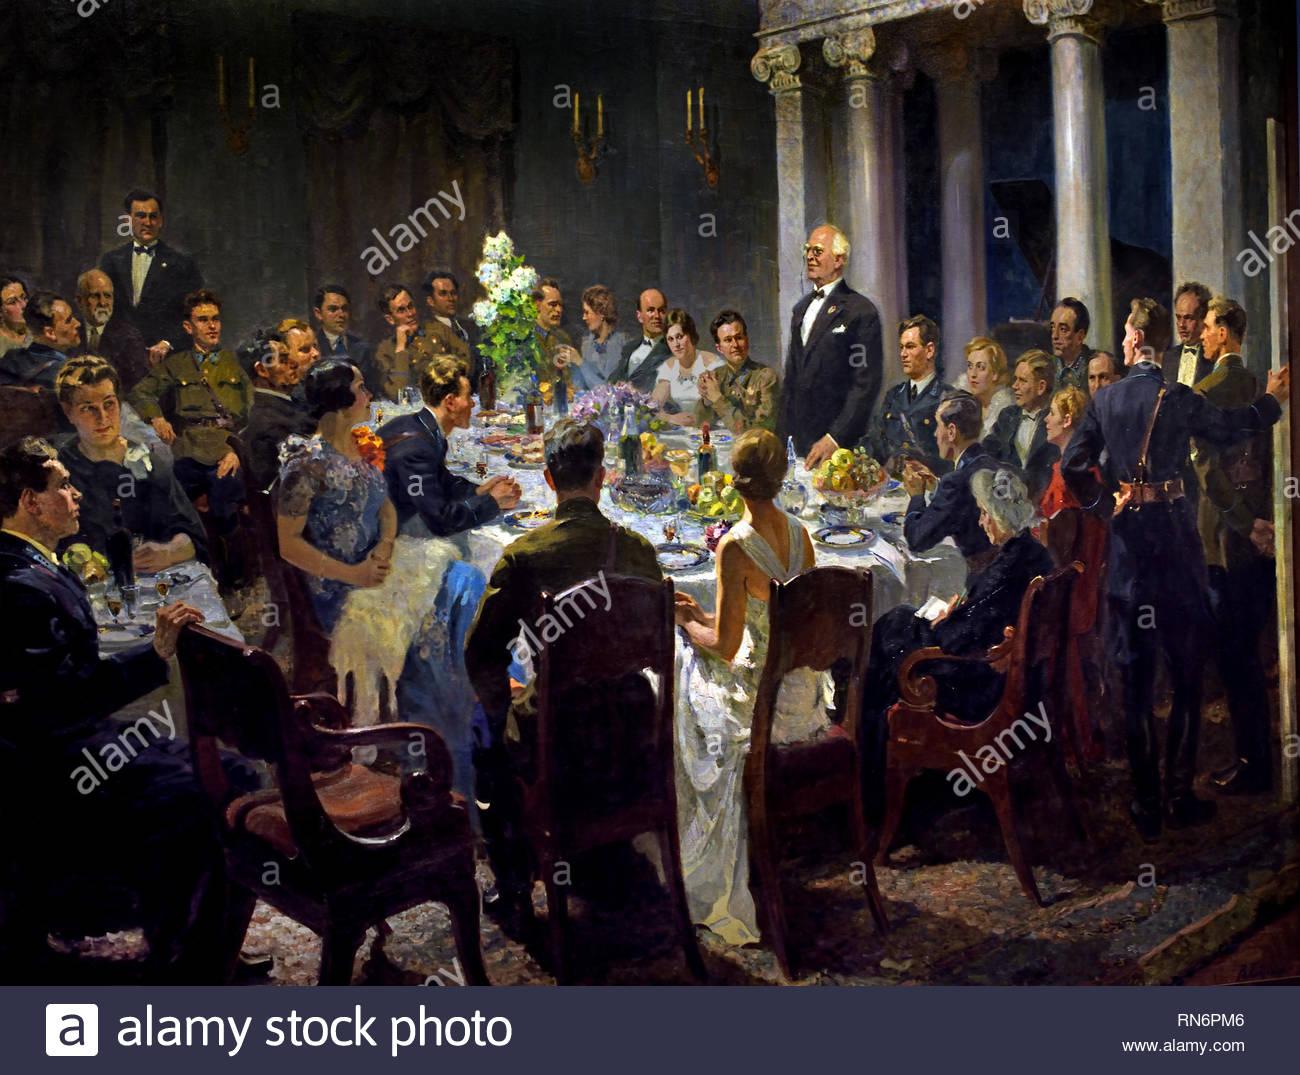 Artists of the Konstantin Stanislavsky Theatre Meeting Students of the Nikolai Zhukovsky Air Force Academy - 1938 by Painter Vasily Efanov. Soviet Union Communist Propaganda (Russia under Lenin and Stalin1921-1953 ). - Stock Image